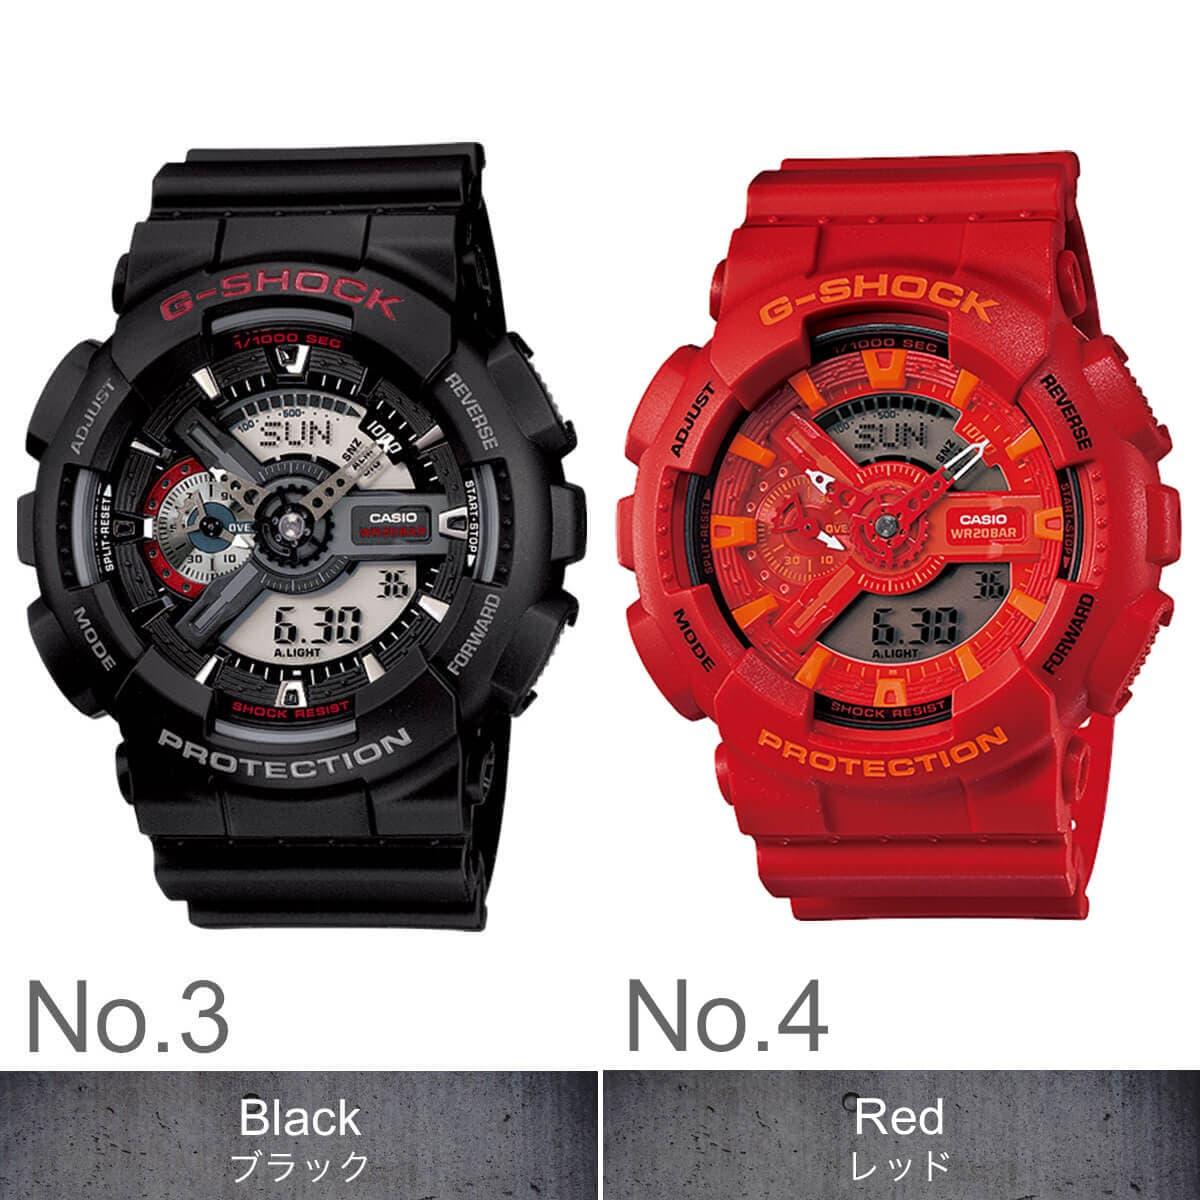 Watch Lab Casio Clock G Shock Gd X6900ht 2 Resin Band Blue Men Gold Ga 110gb 1ajf Liquid Crystal Waterproofing Black Fe Present